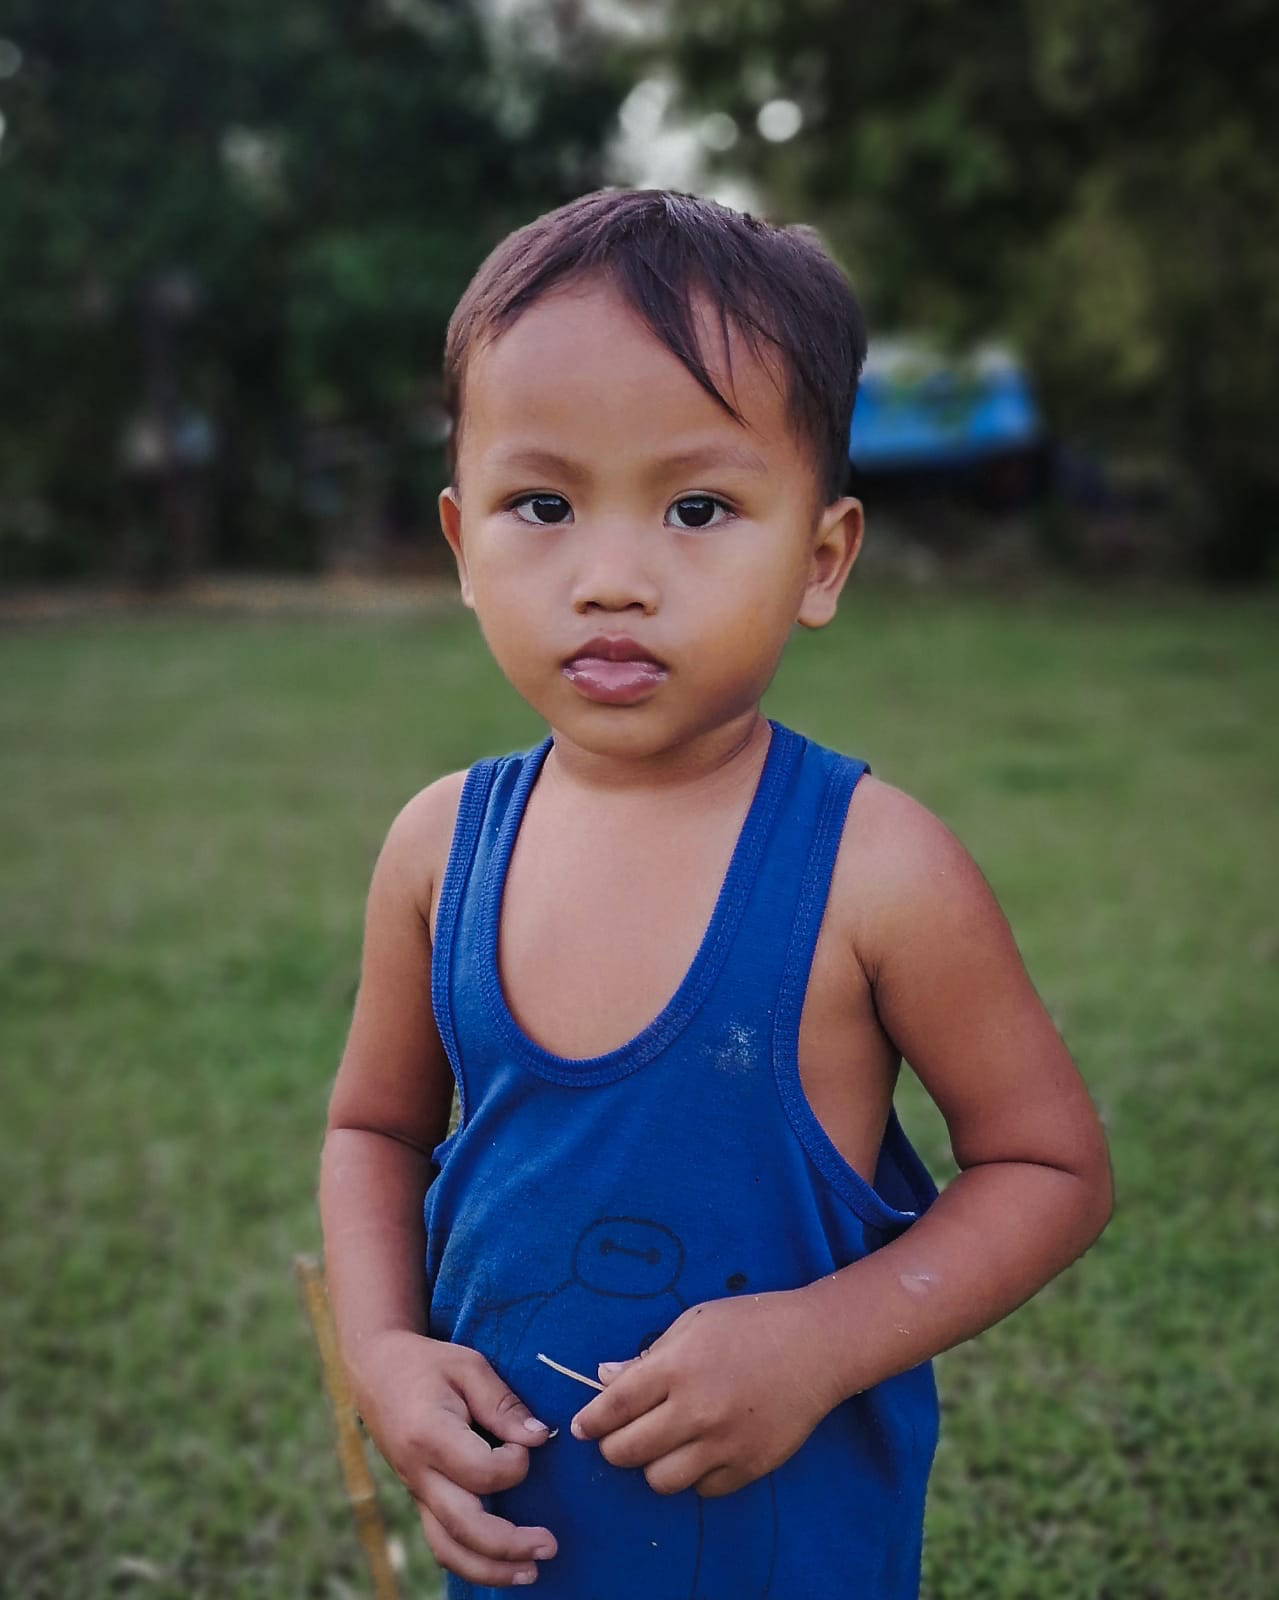 travel-blog-blogger-redhead-round-the-world-palawan-el-nido-elnido-little-boy-philippines.jpg